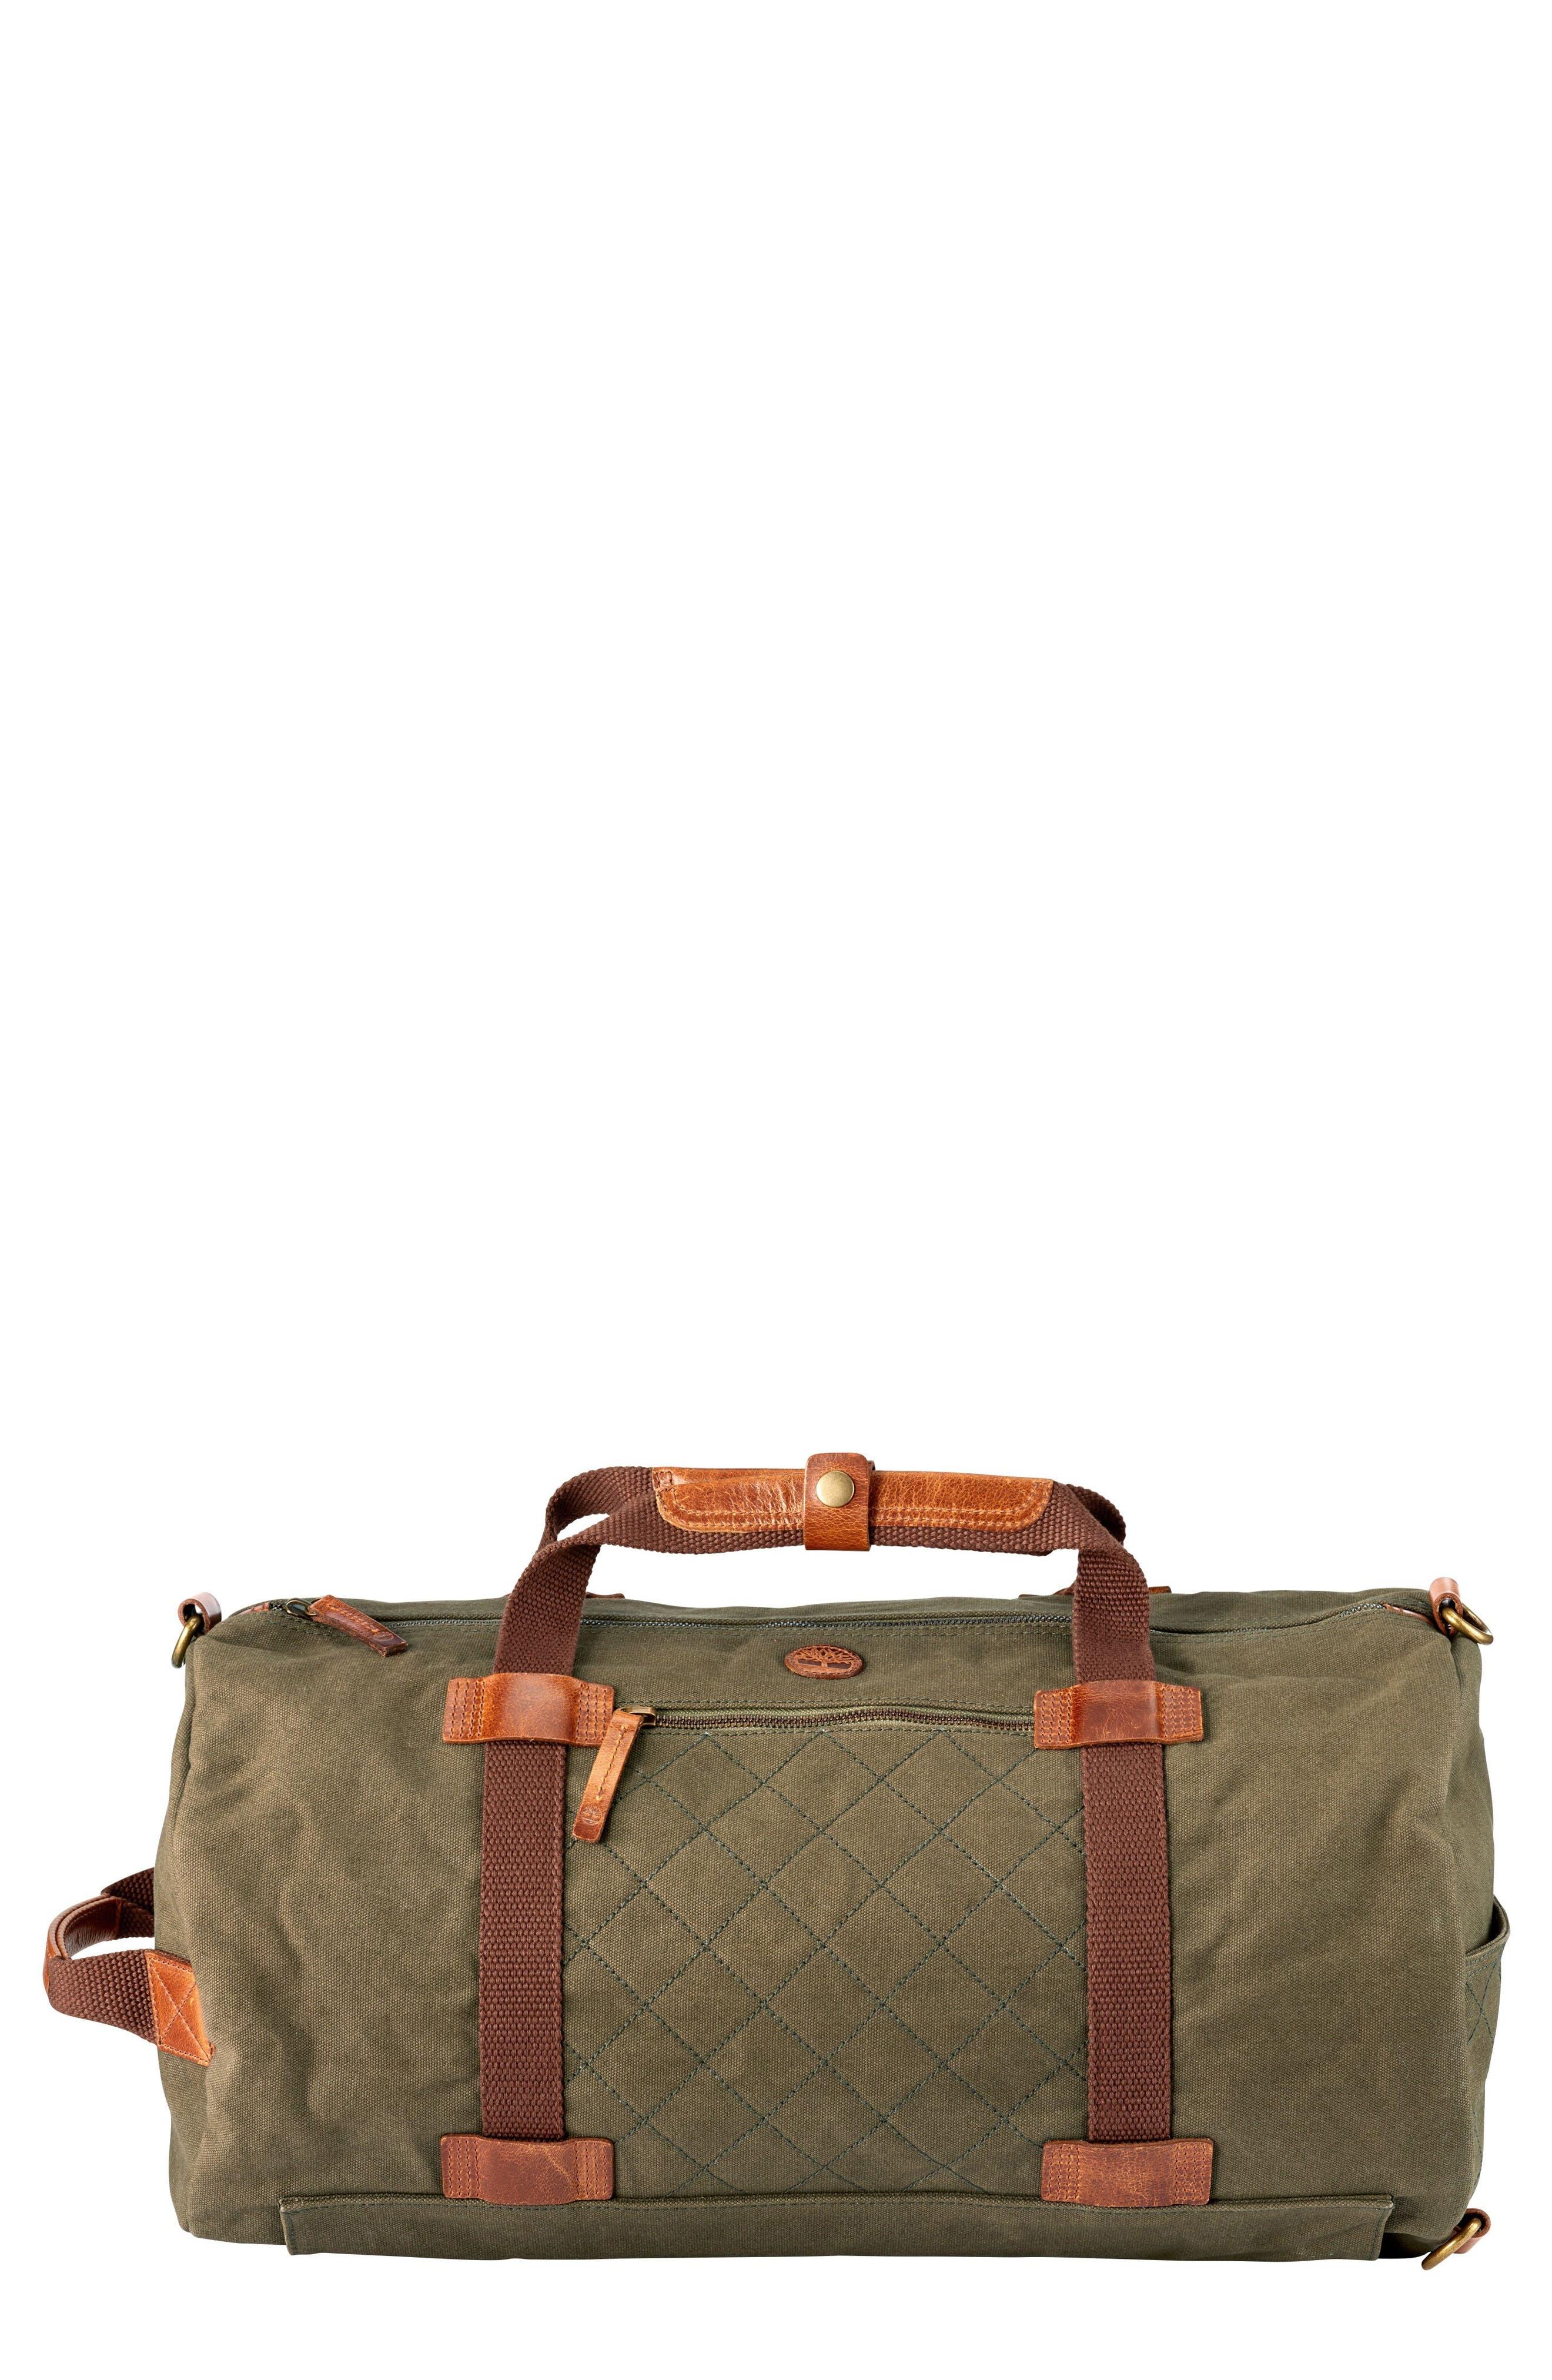 Timberland Nantasket Duffel Bag